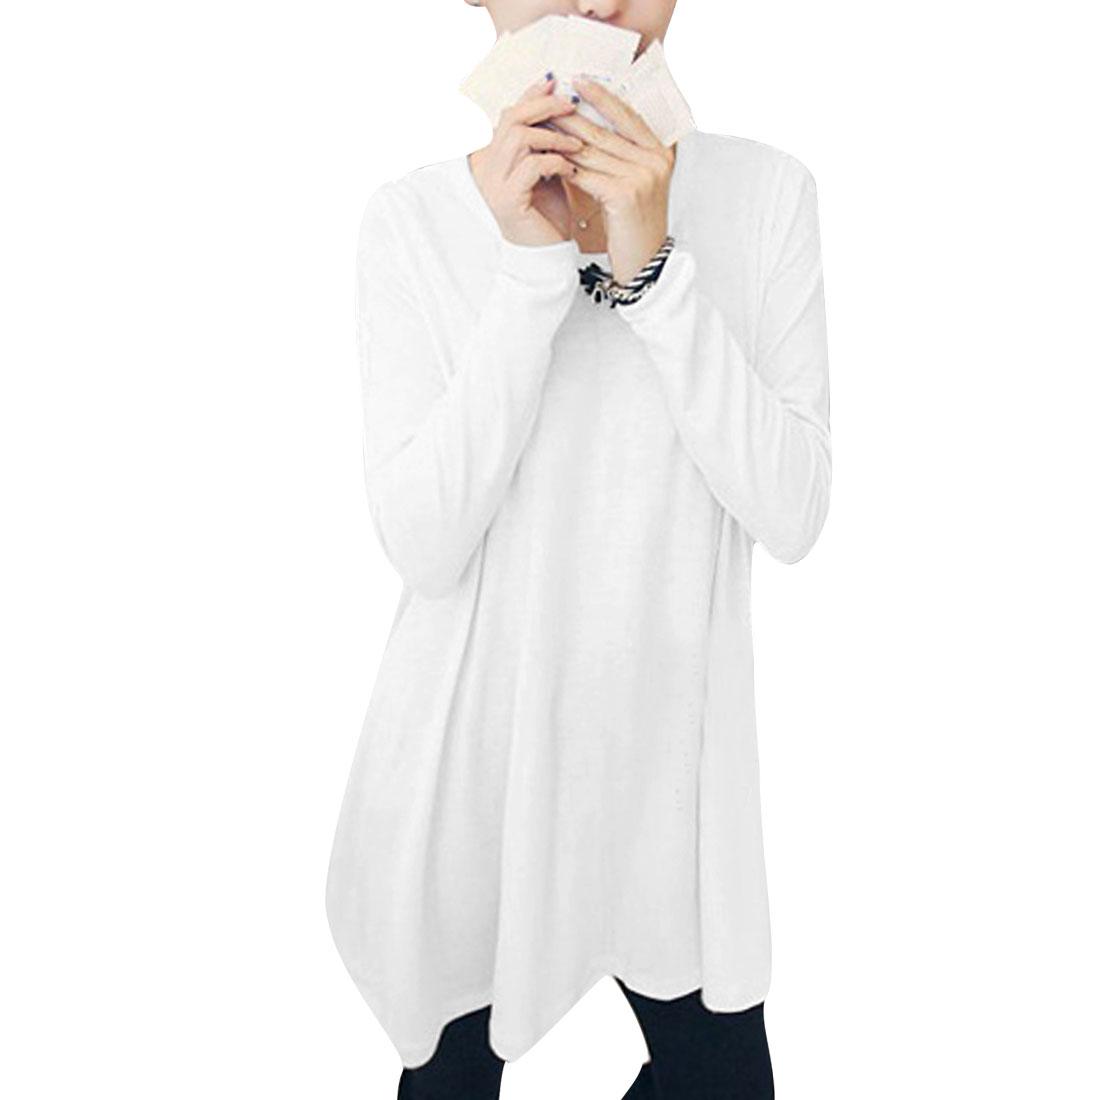 Women Design Stylish Elastic Semi Sheer Tunic Shirt White XS